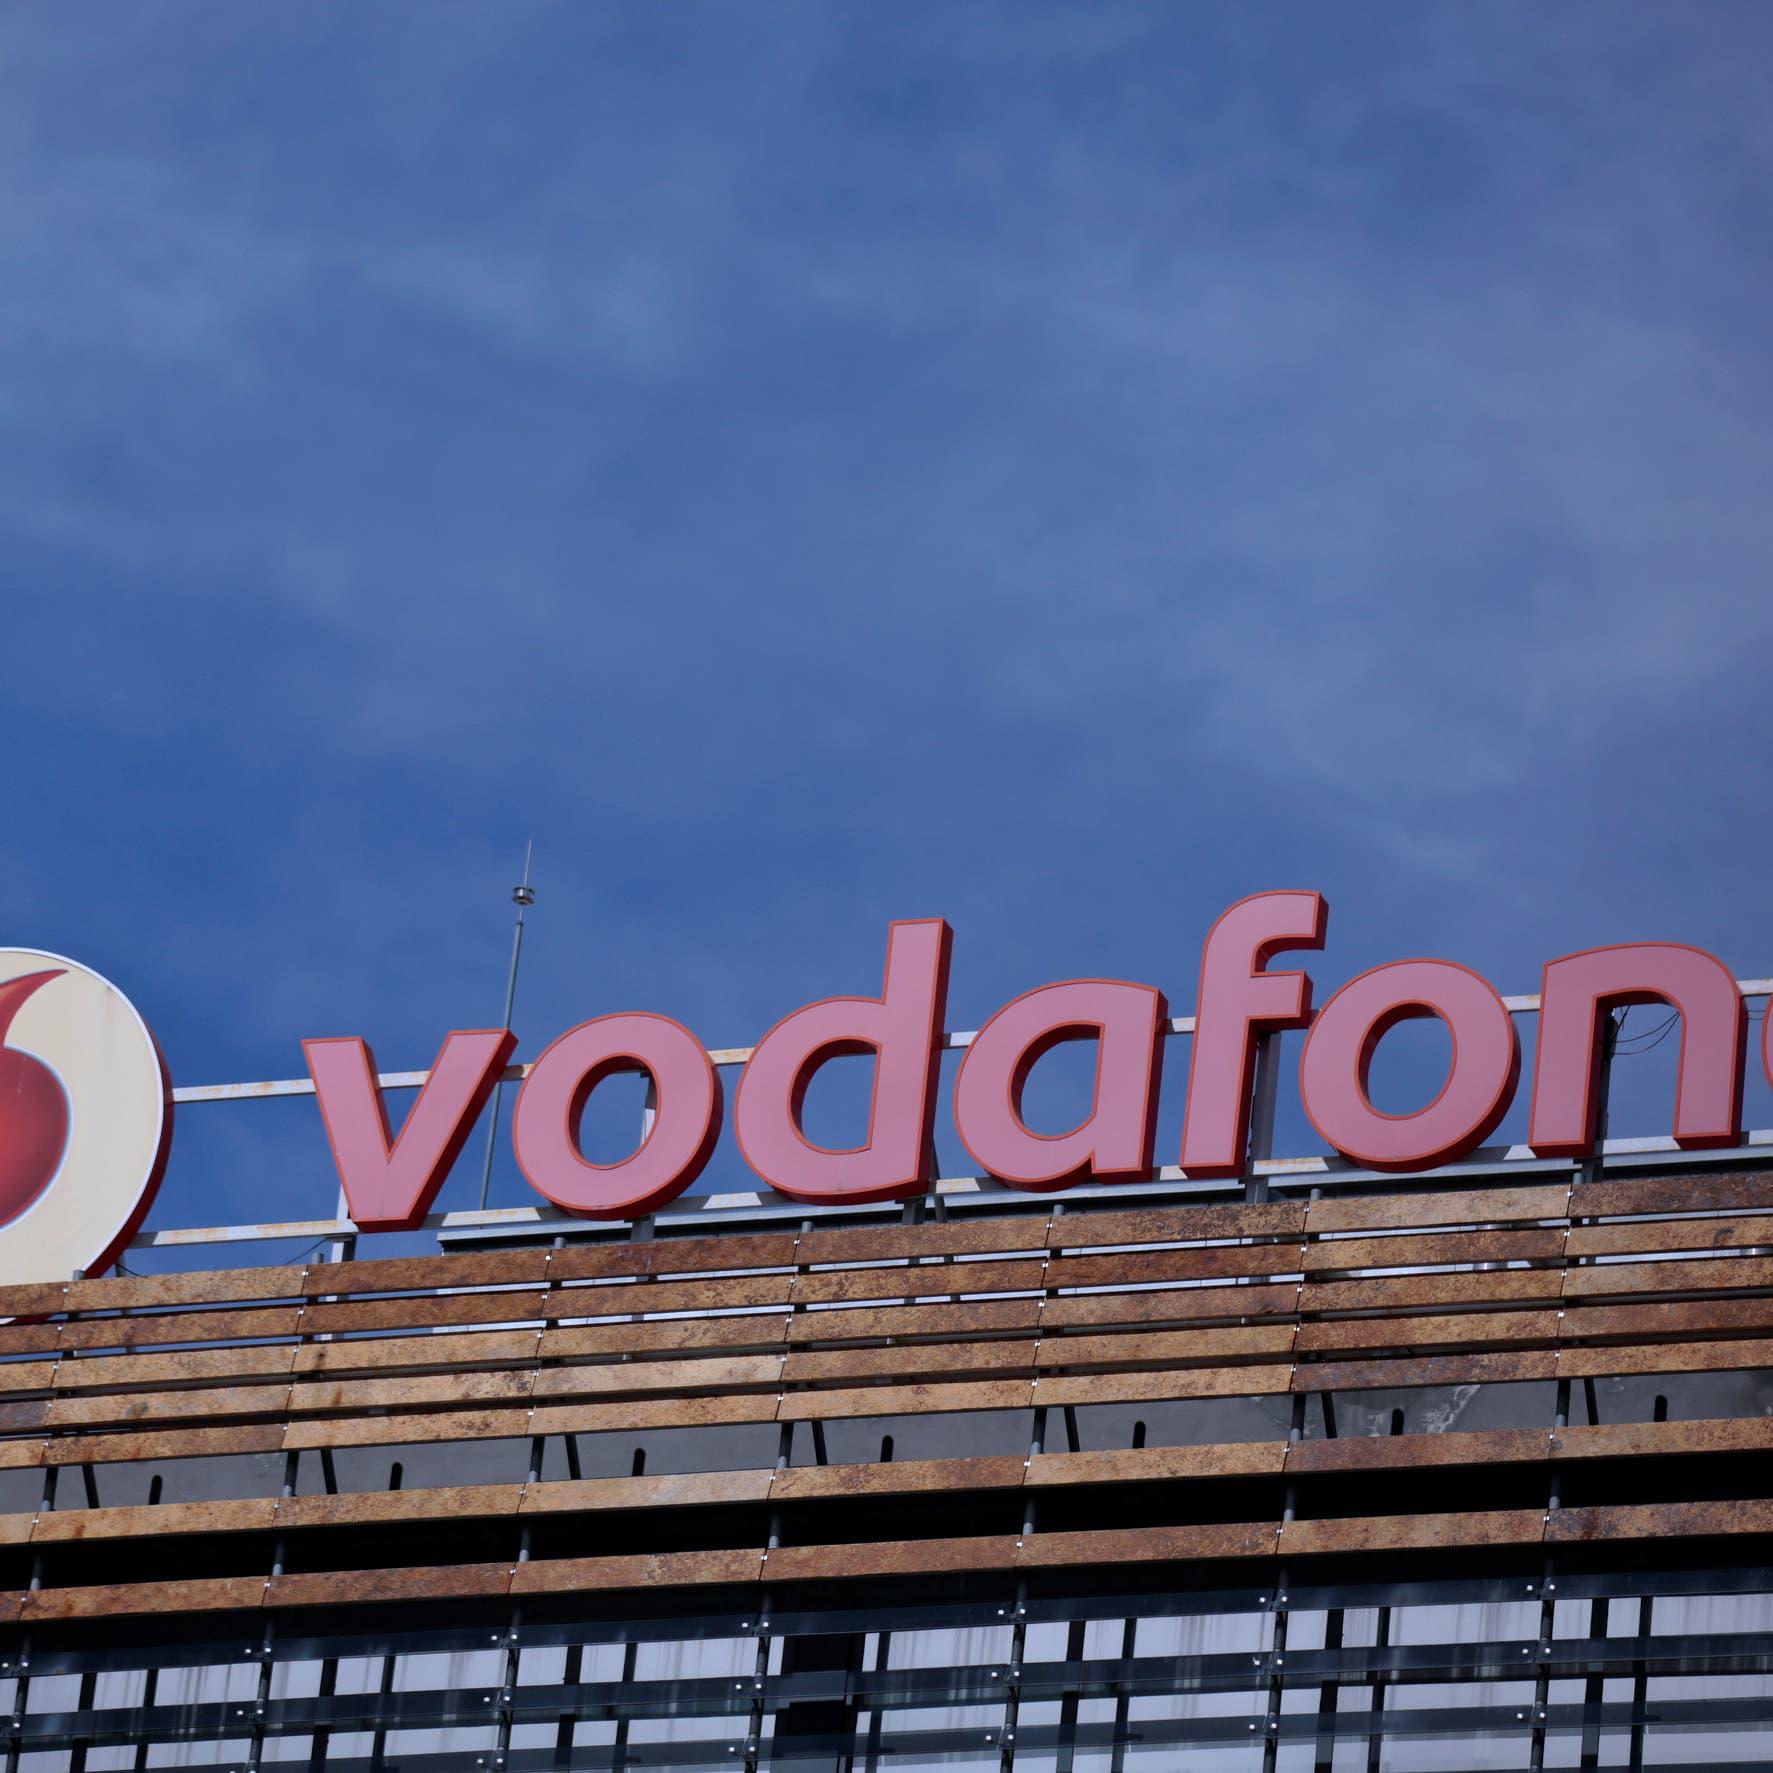 فودافون مصر تمول ذاتياً حصولها على ترددات بـ 540 مليون دولار